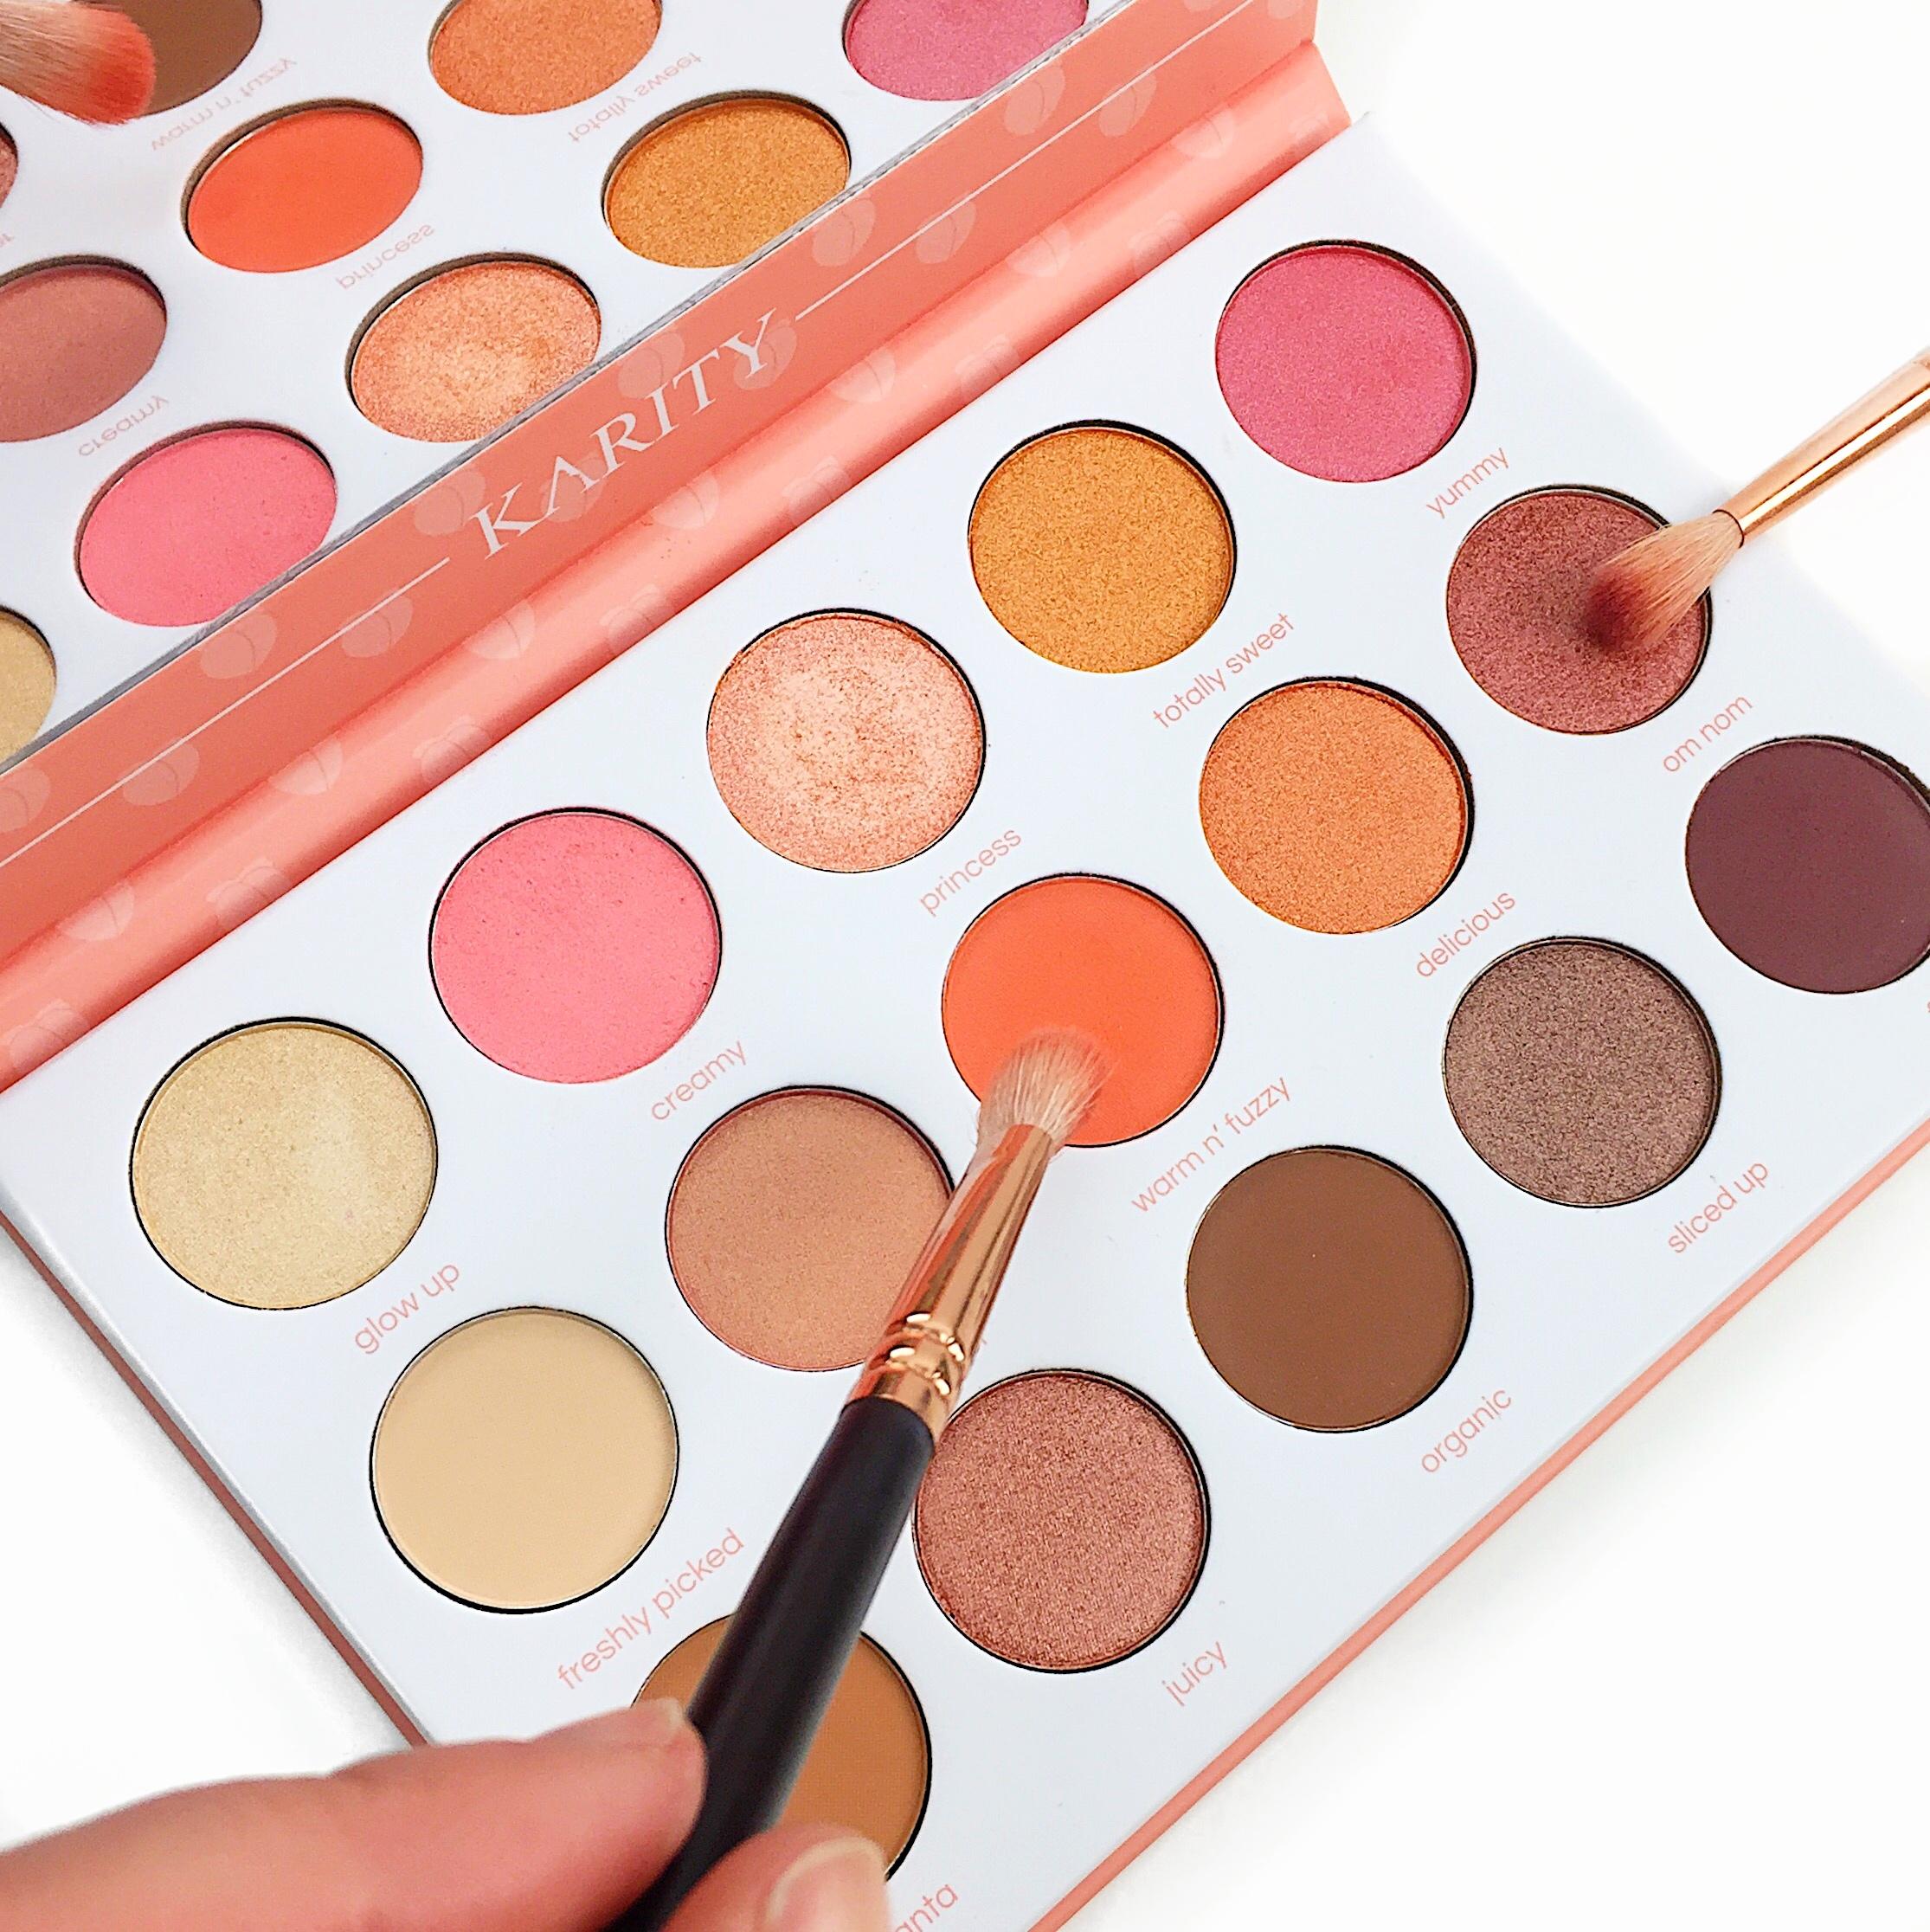 Marisa Robinson Beauty Peach Palettes Karity Just Peachy Palette